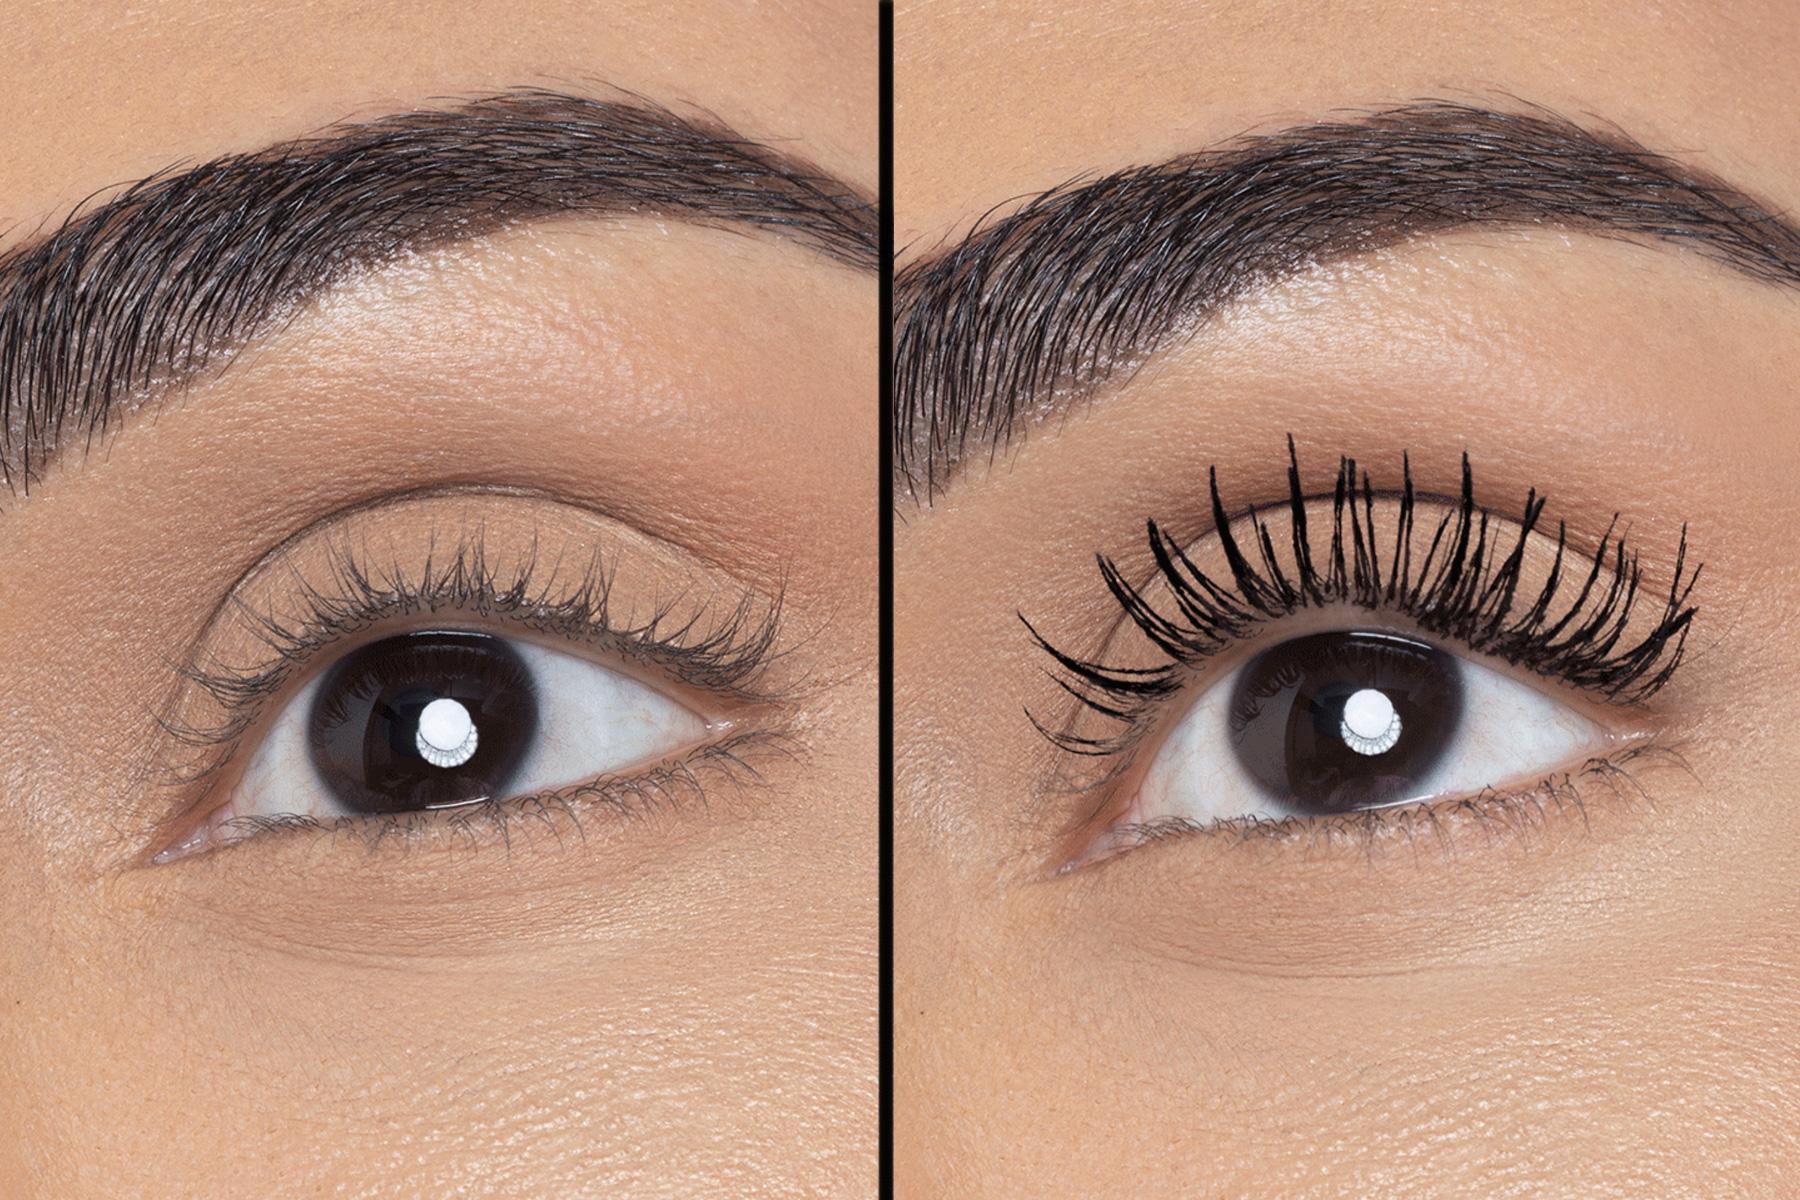 huda beauty legit lashes swatch avant apres